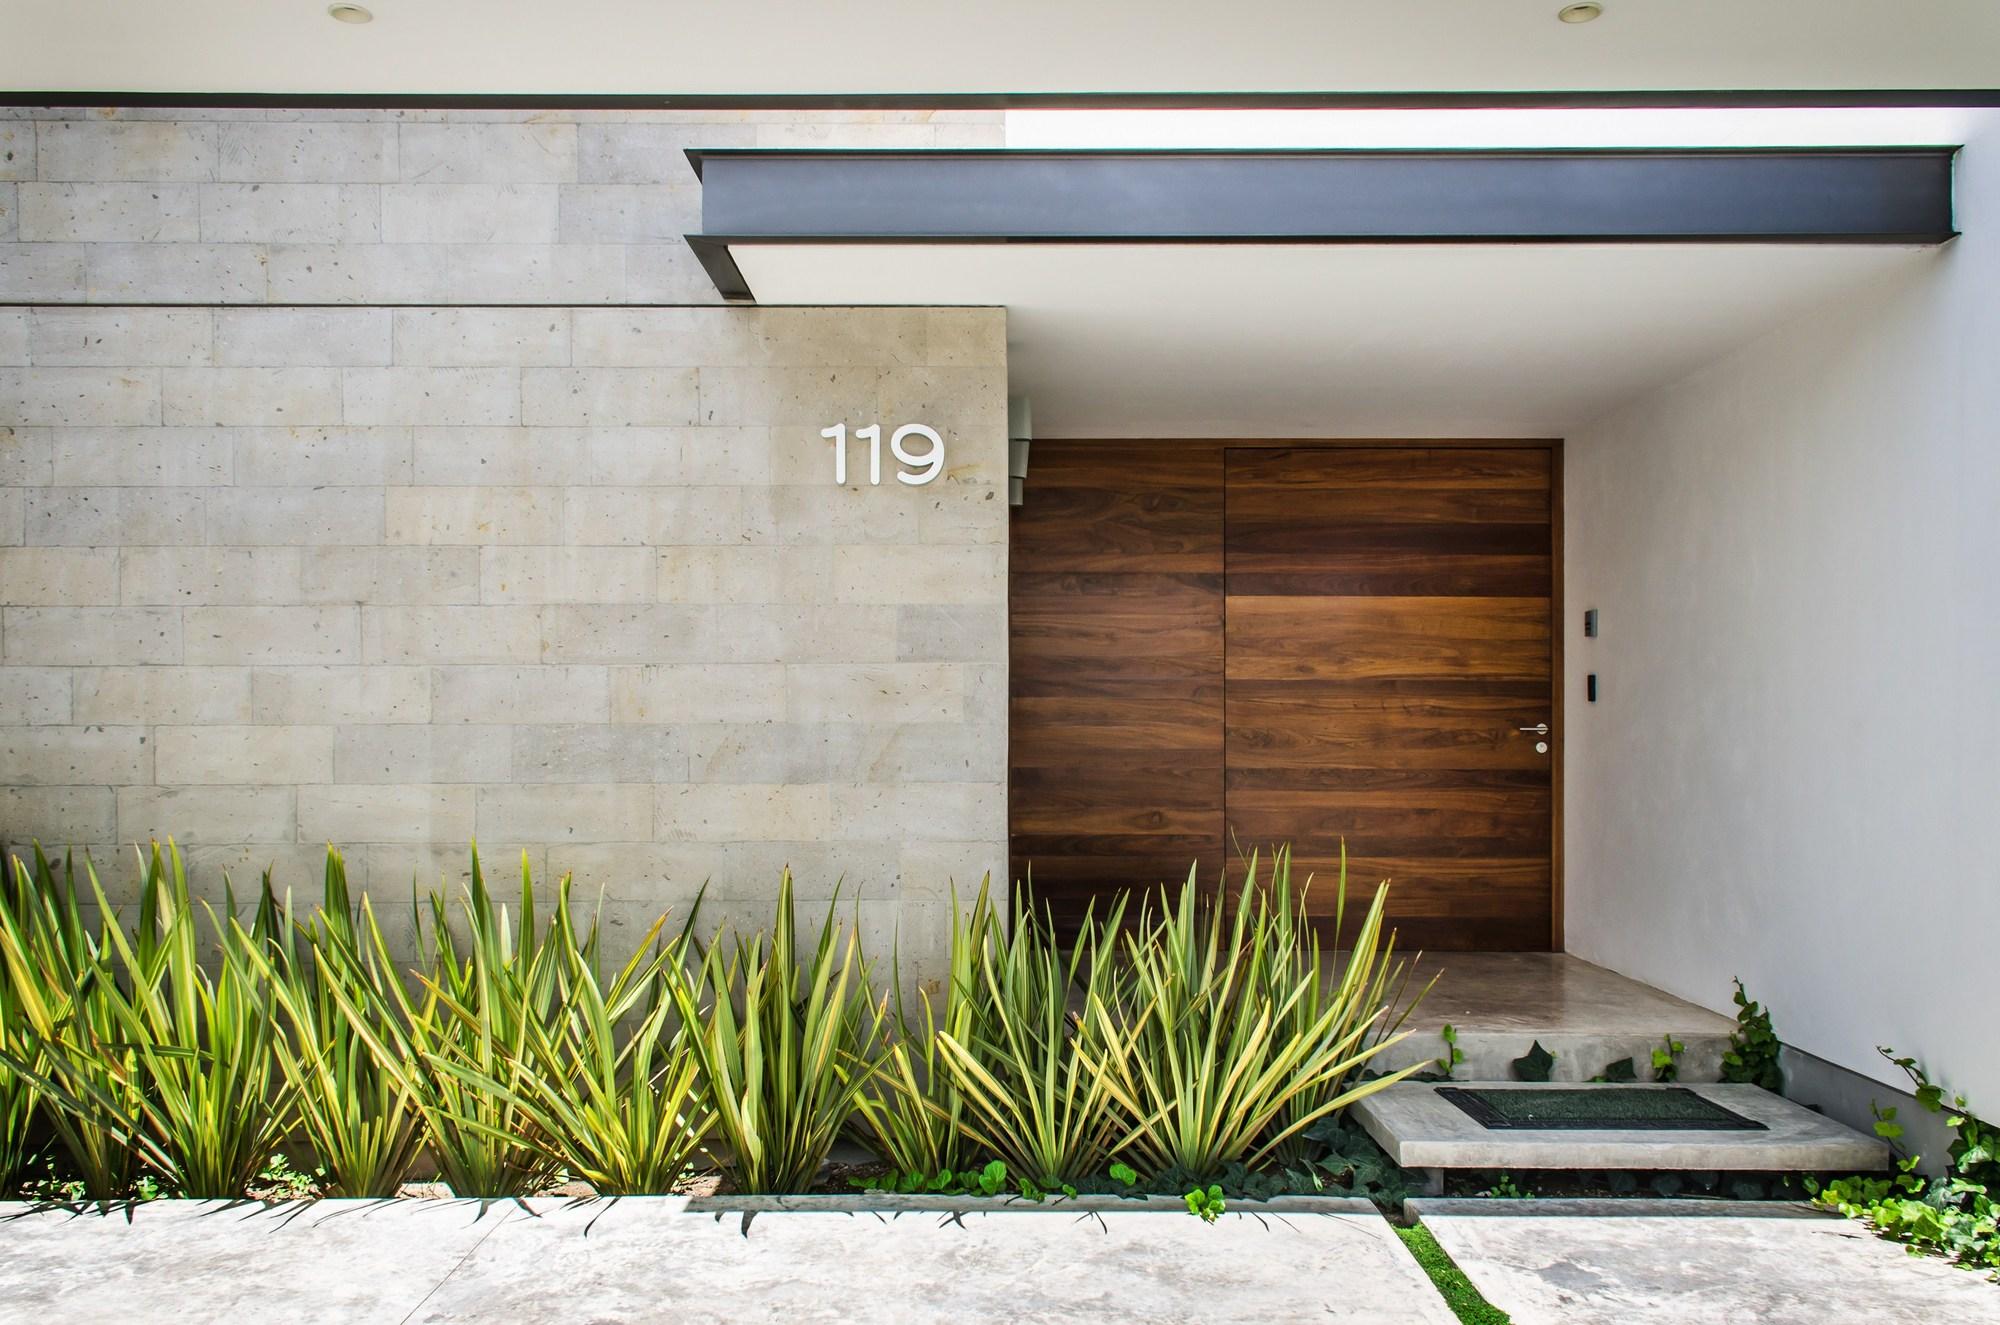 Galer a de t02 adi arquitectura y dise o interior 3 for Arquitectura y diseno interior